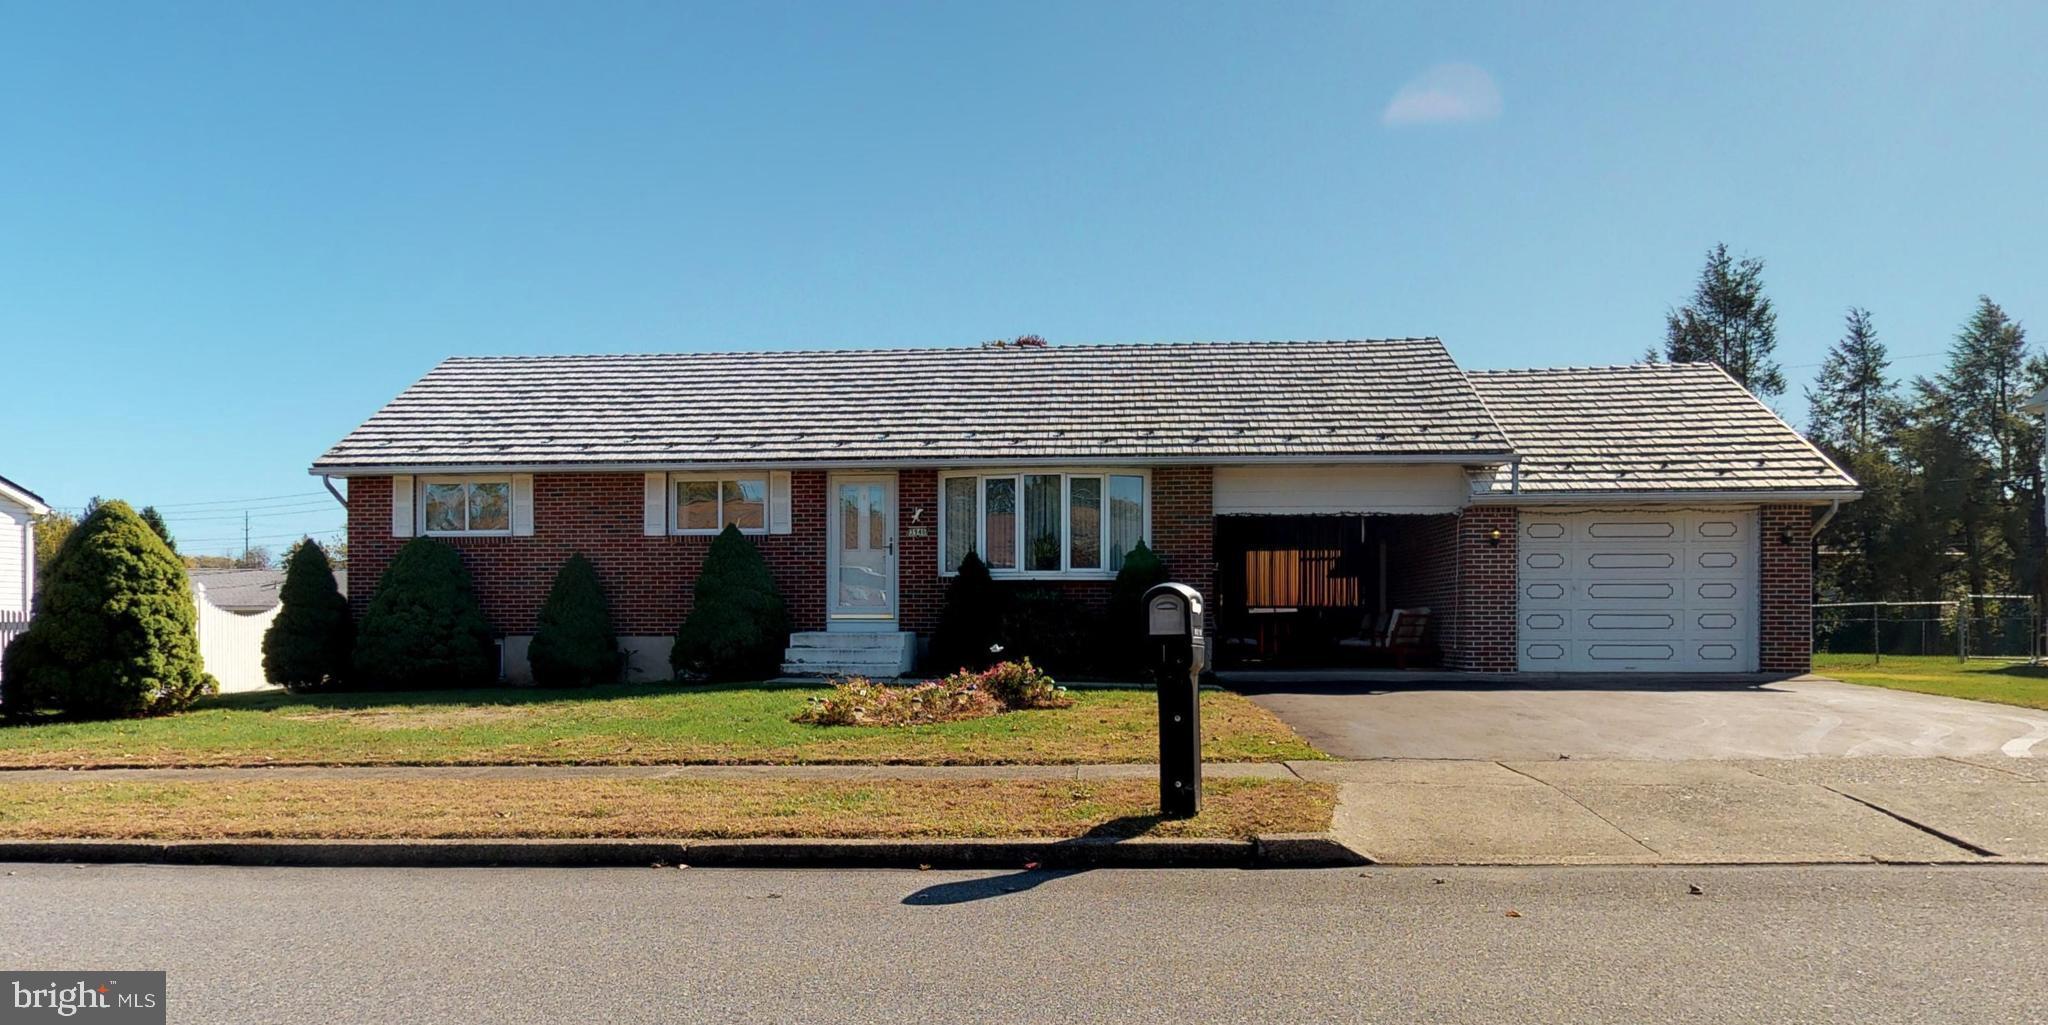 3946 RUTLAND ROAD, BETHLEHEM, PA 18020